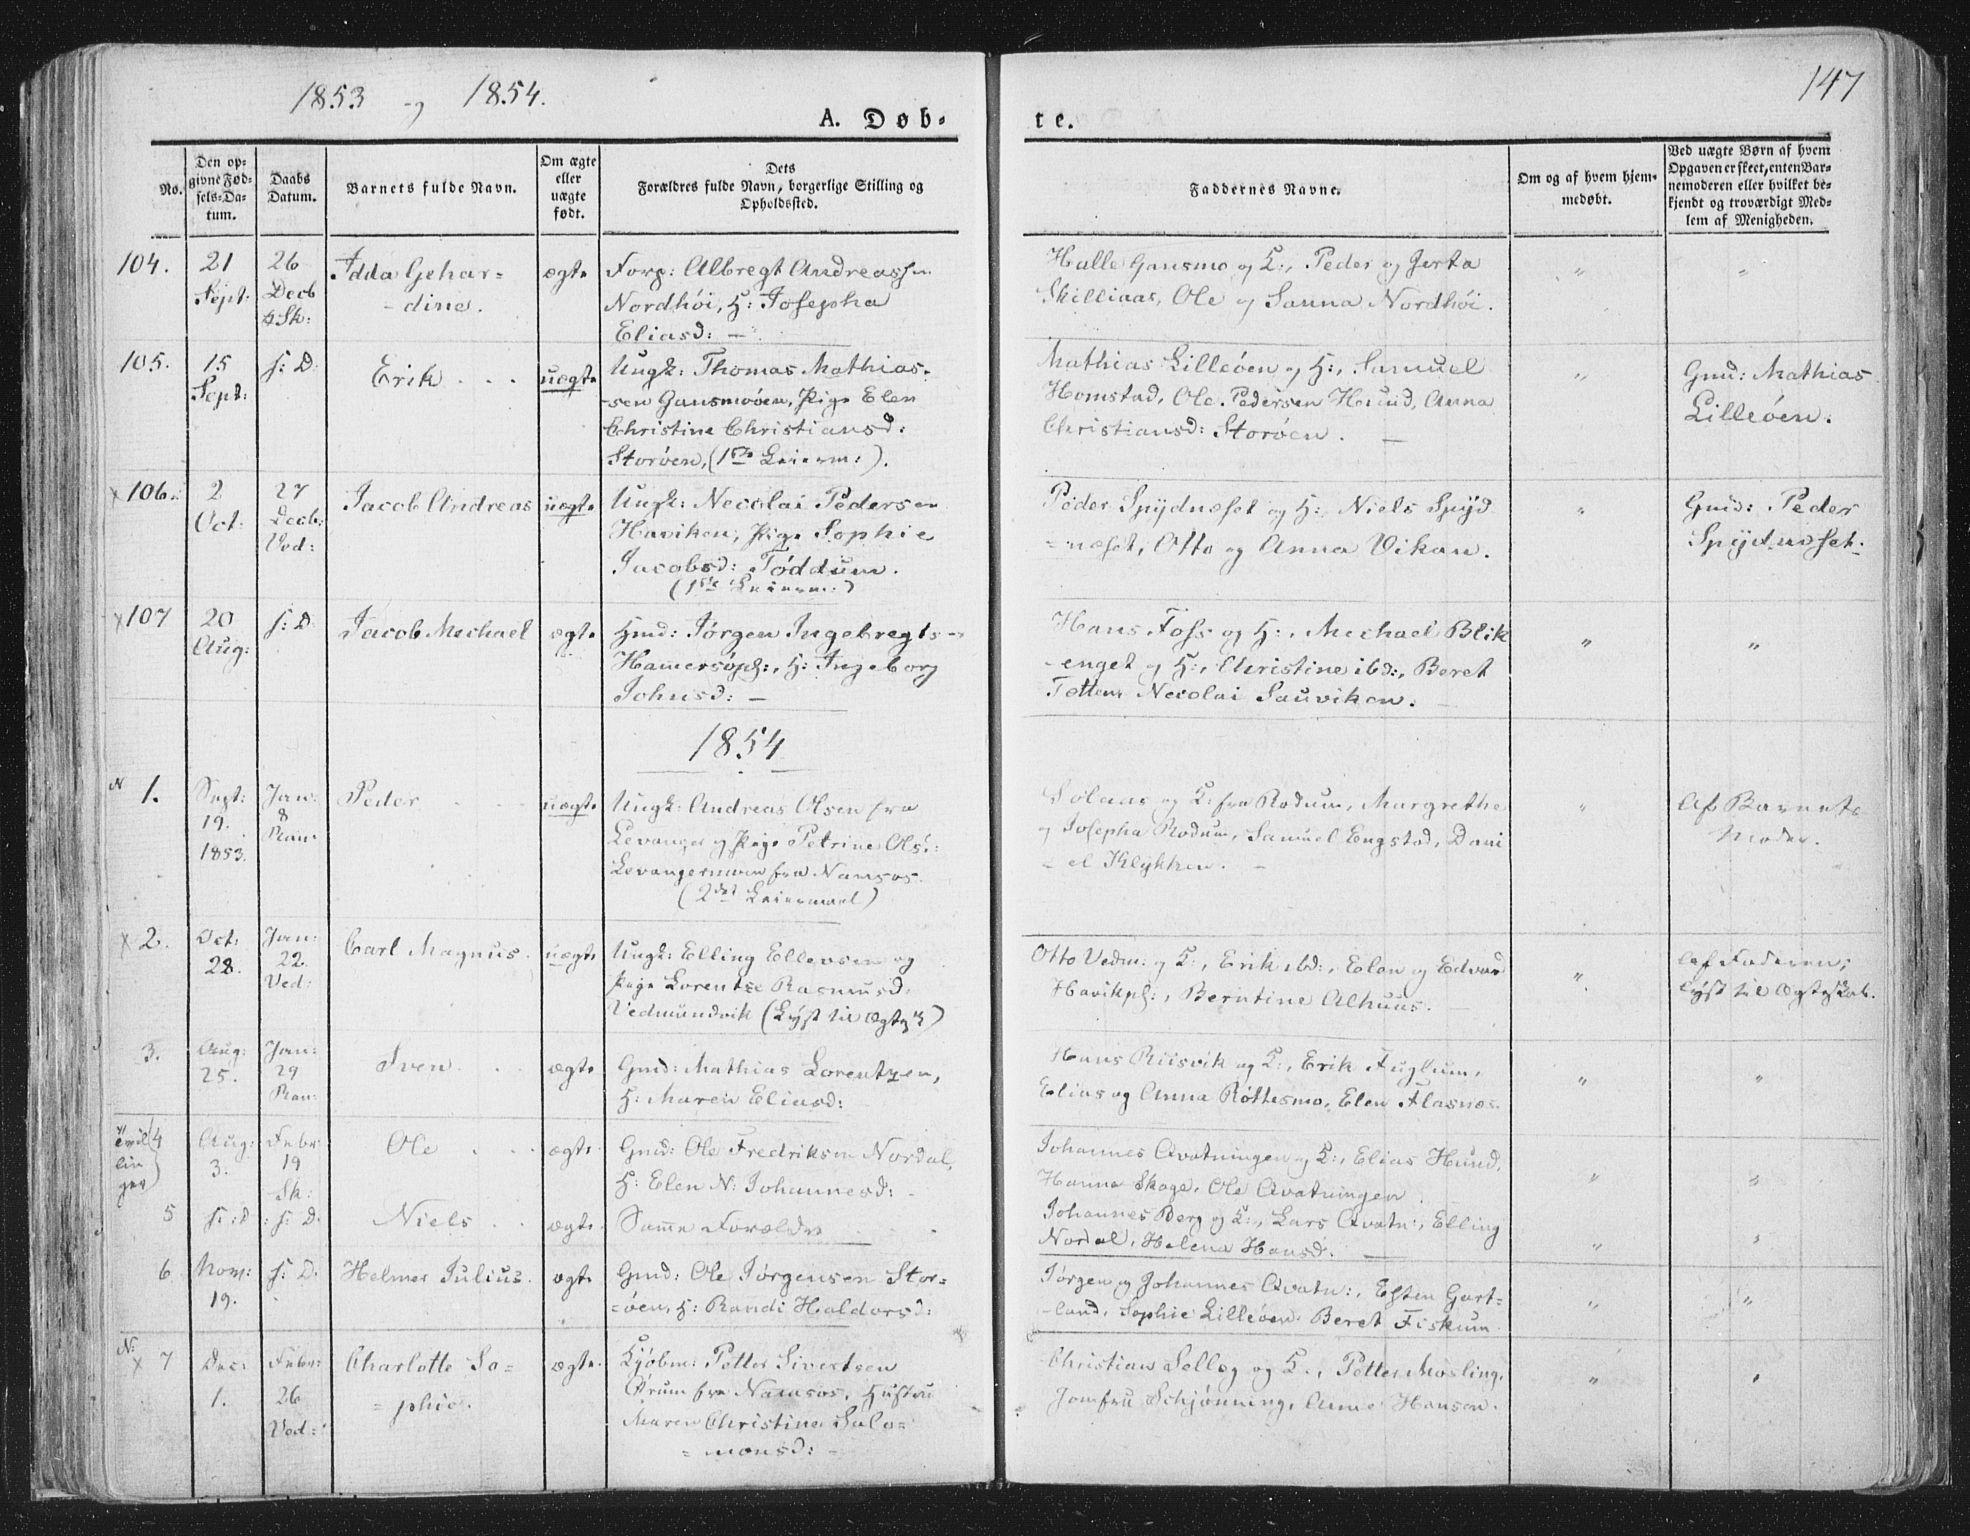 SAT, Ministerialprotokoller, klokkerbøker og fødselsregistre - Nord-Trøndelag, 764/L0551: Ministerialbok nr. 764A07a, 1824-1864, s. 147